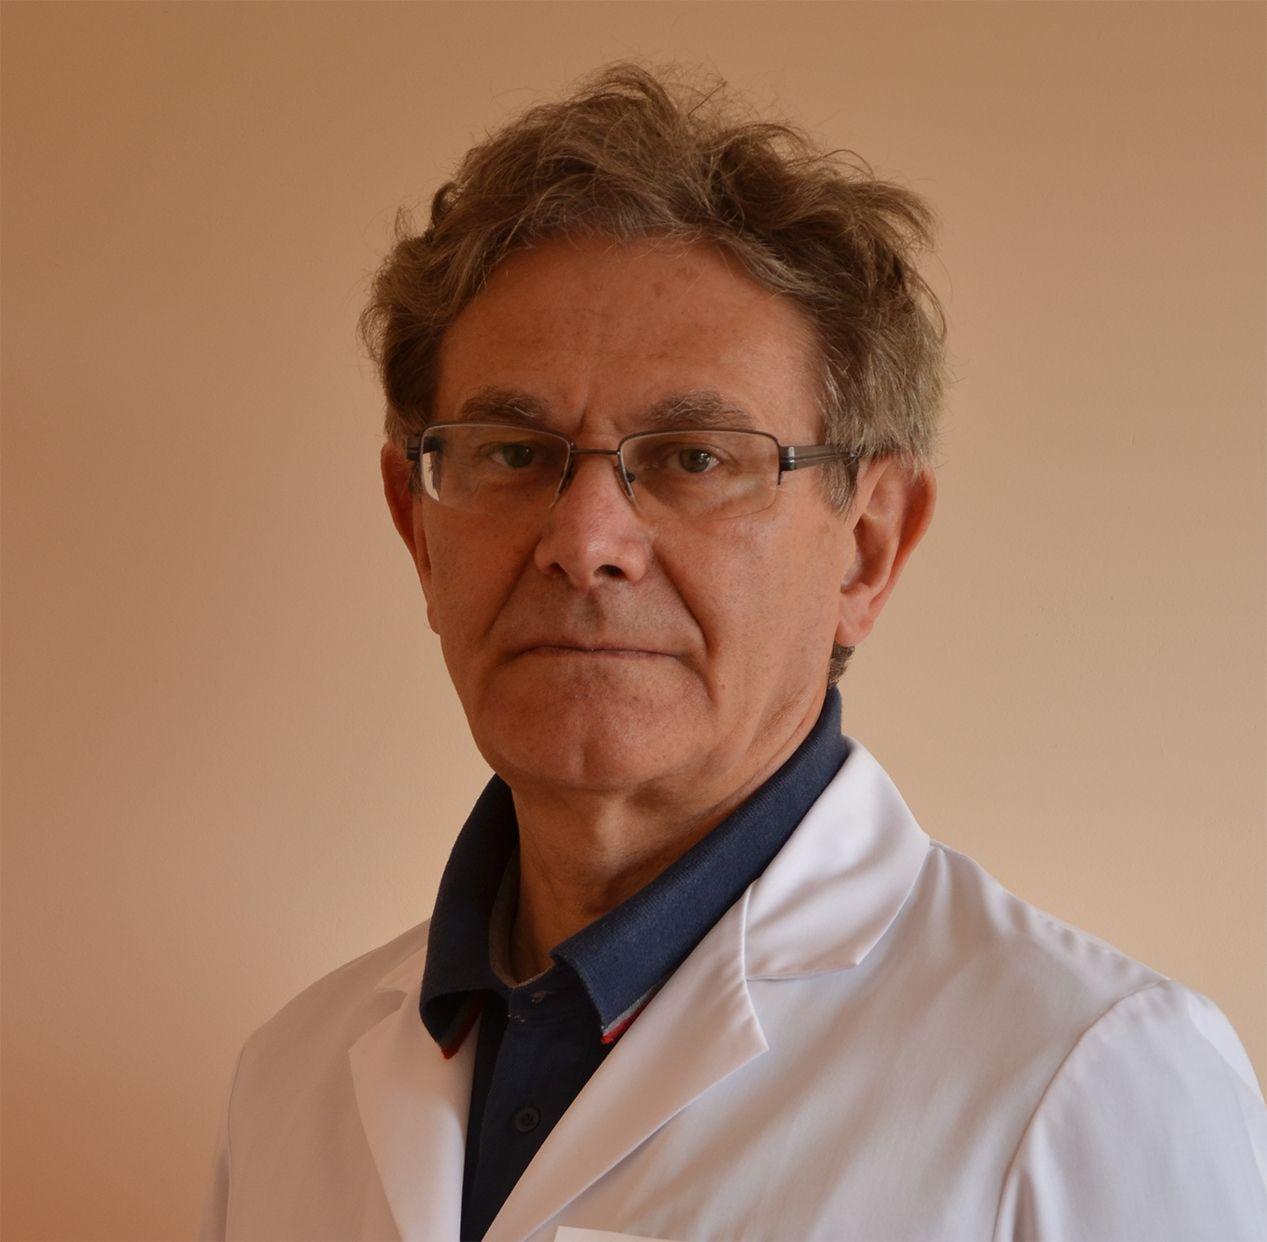 dr.drabik